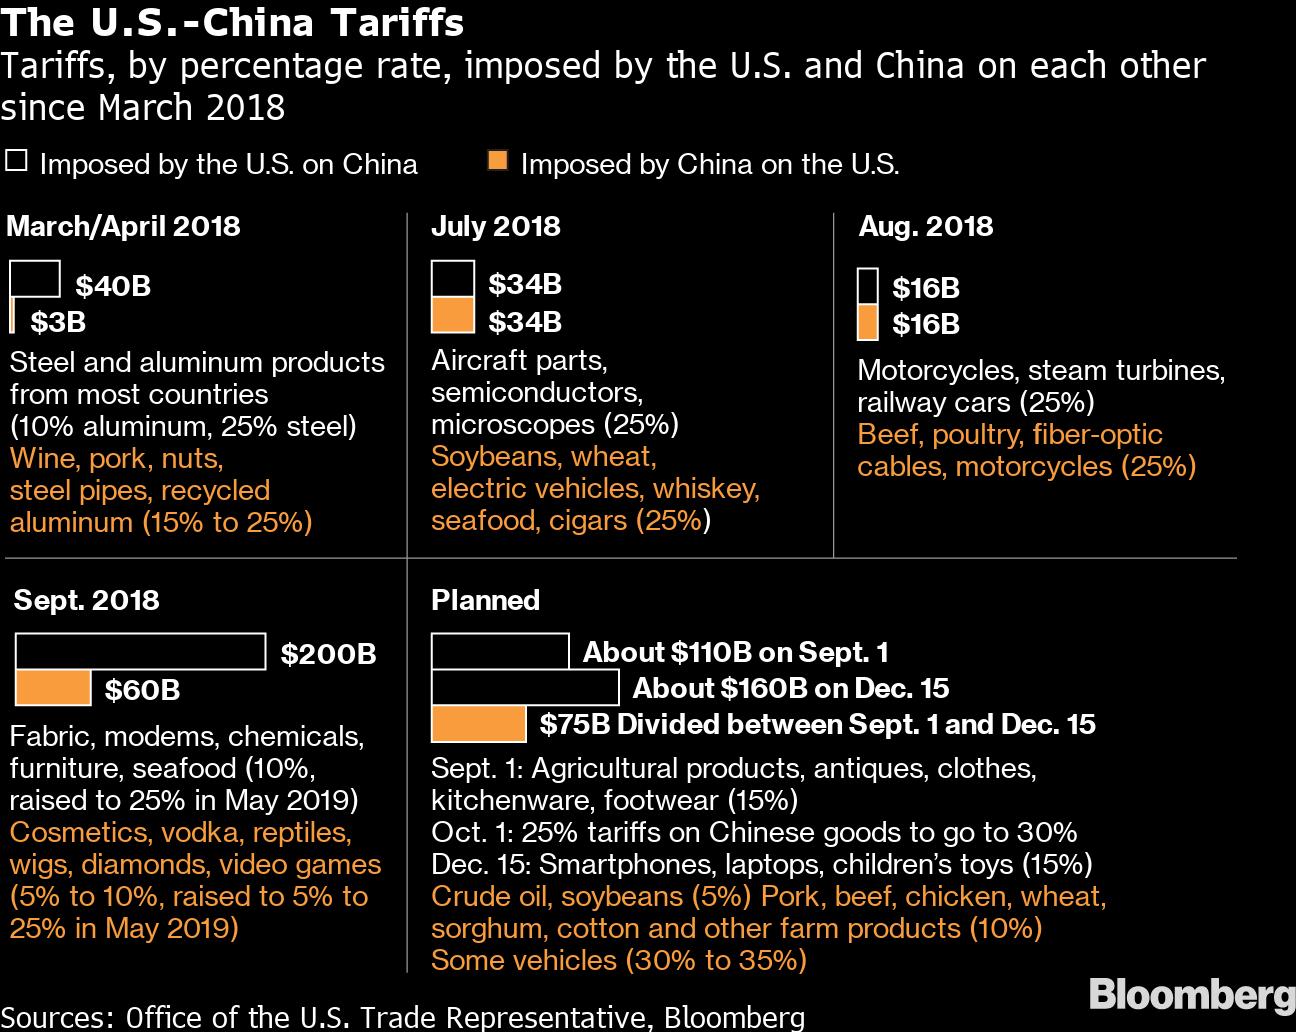 Trump heaps more tariffs on China, still no deal in sight